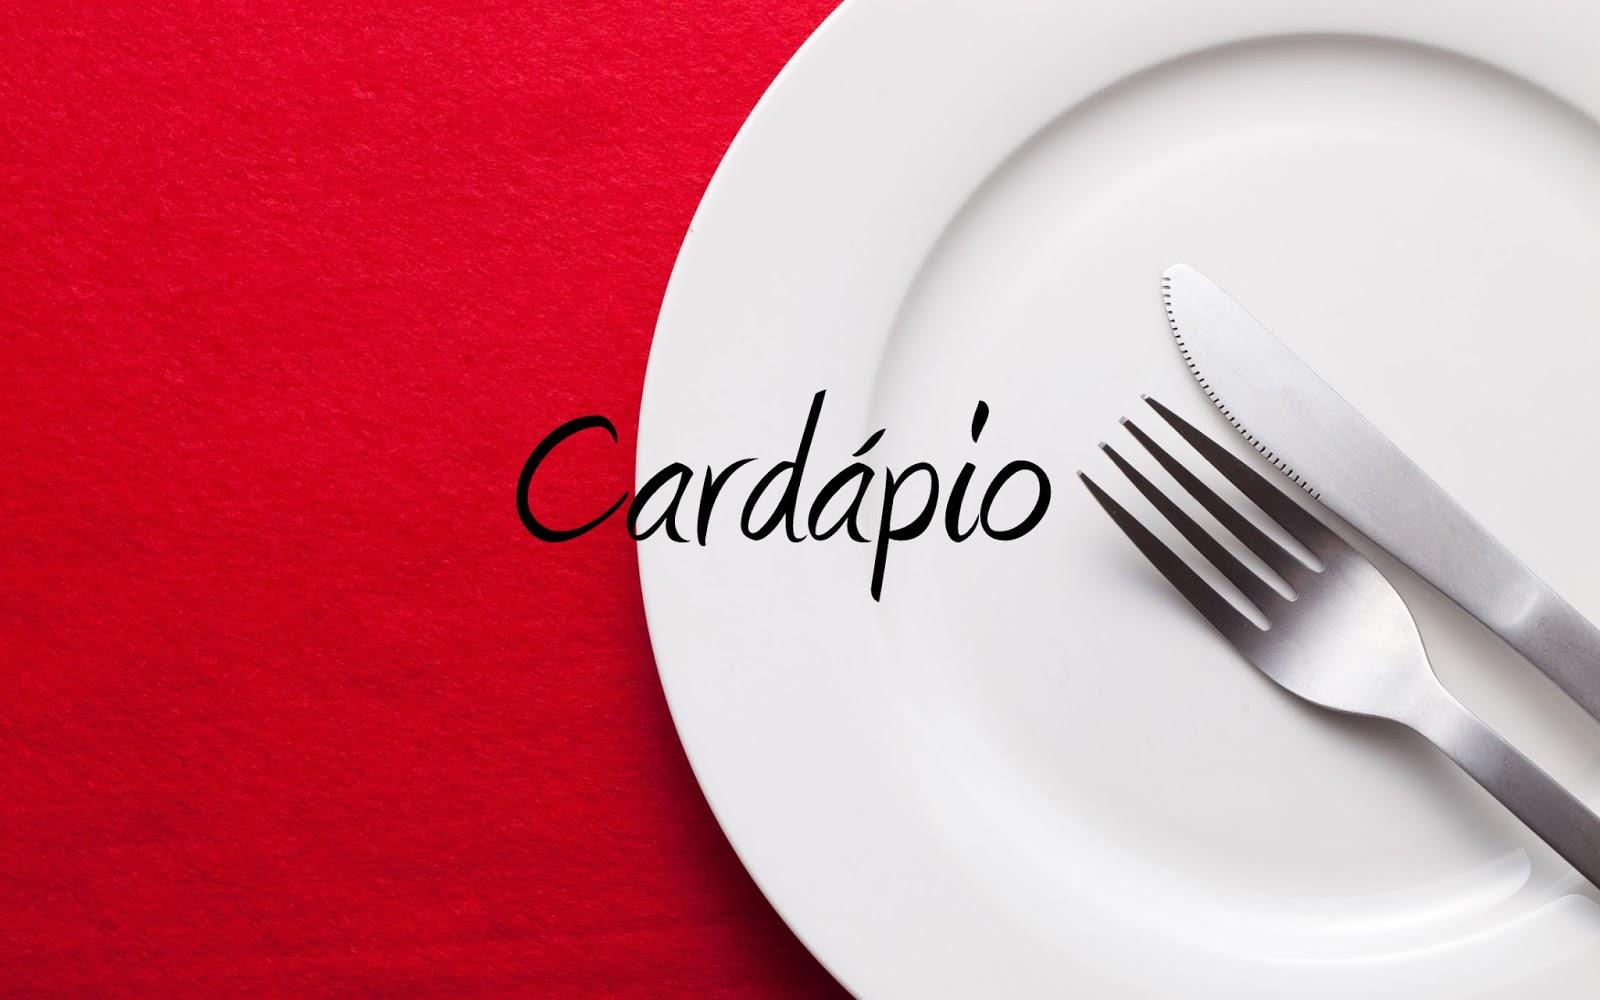 Card Pios Para Estabelecimentos Alimenticios Lanchonetes